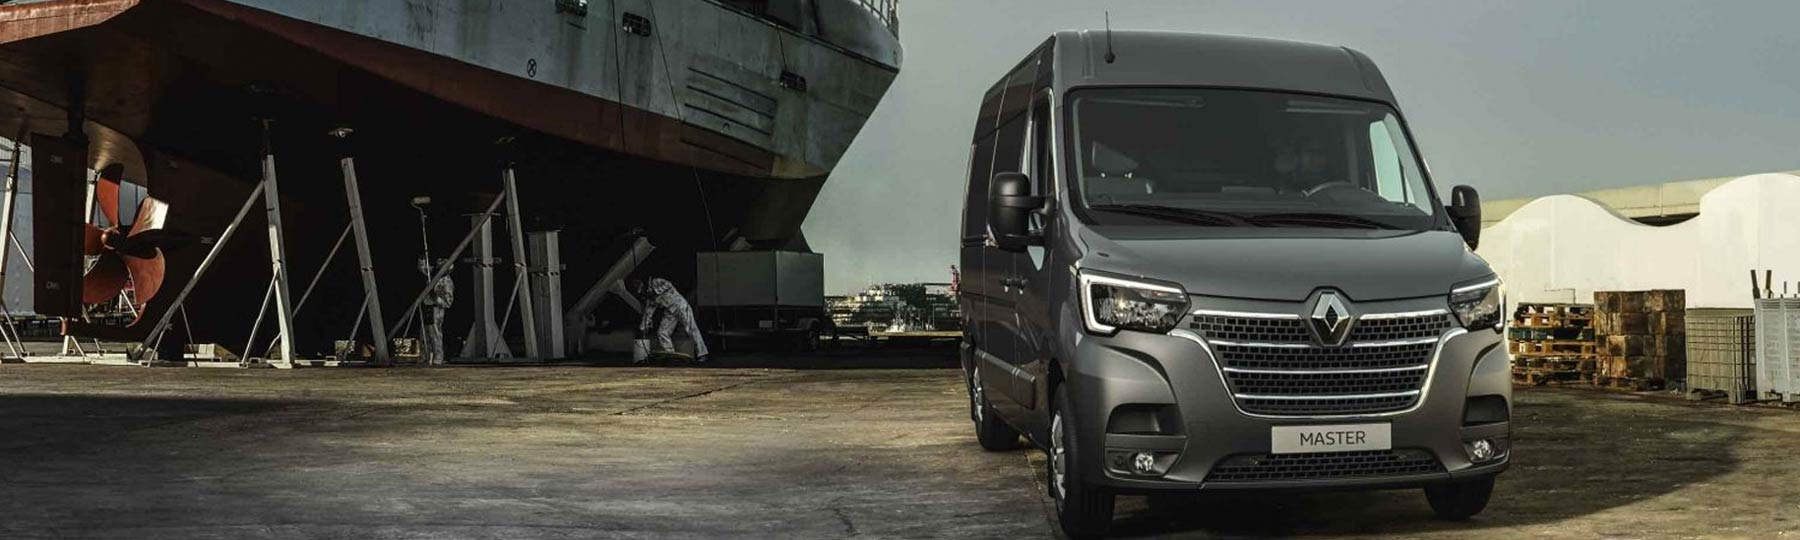 Renault MASTER New Van Offer